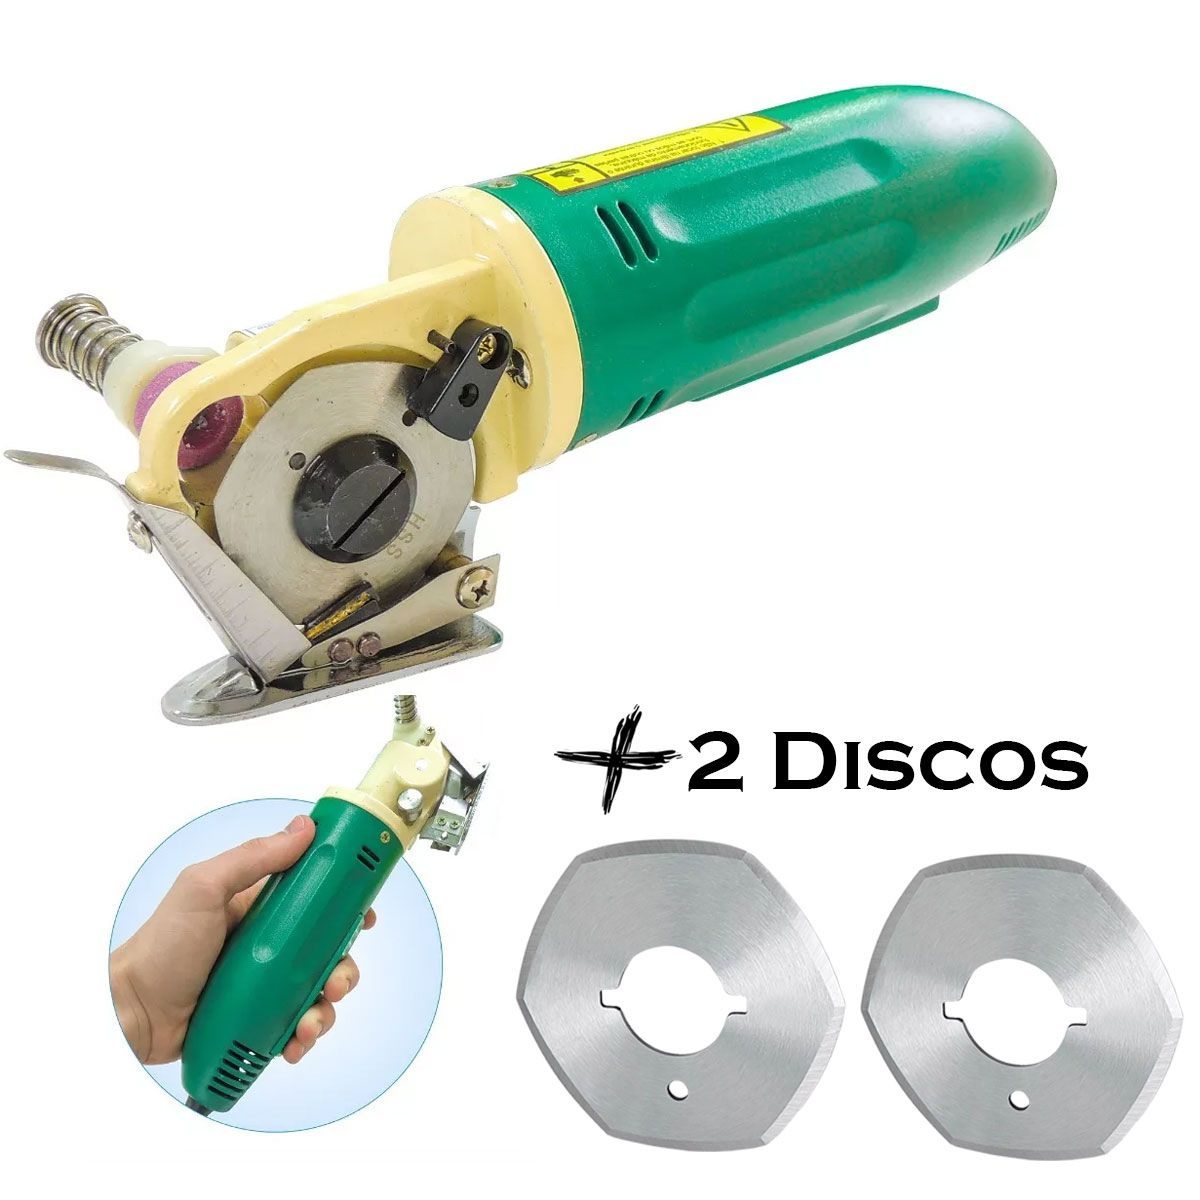 Máquina De Corte Cortar Tecido Bananinha + 2 Discos